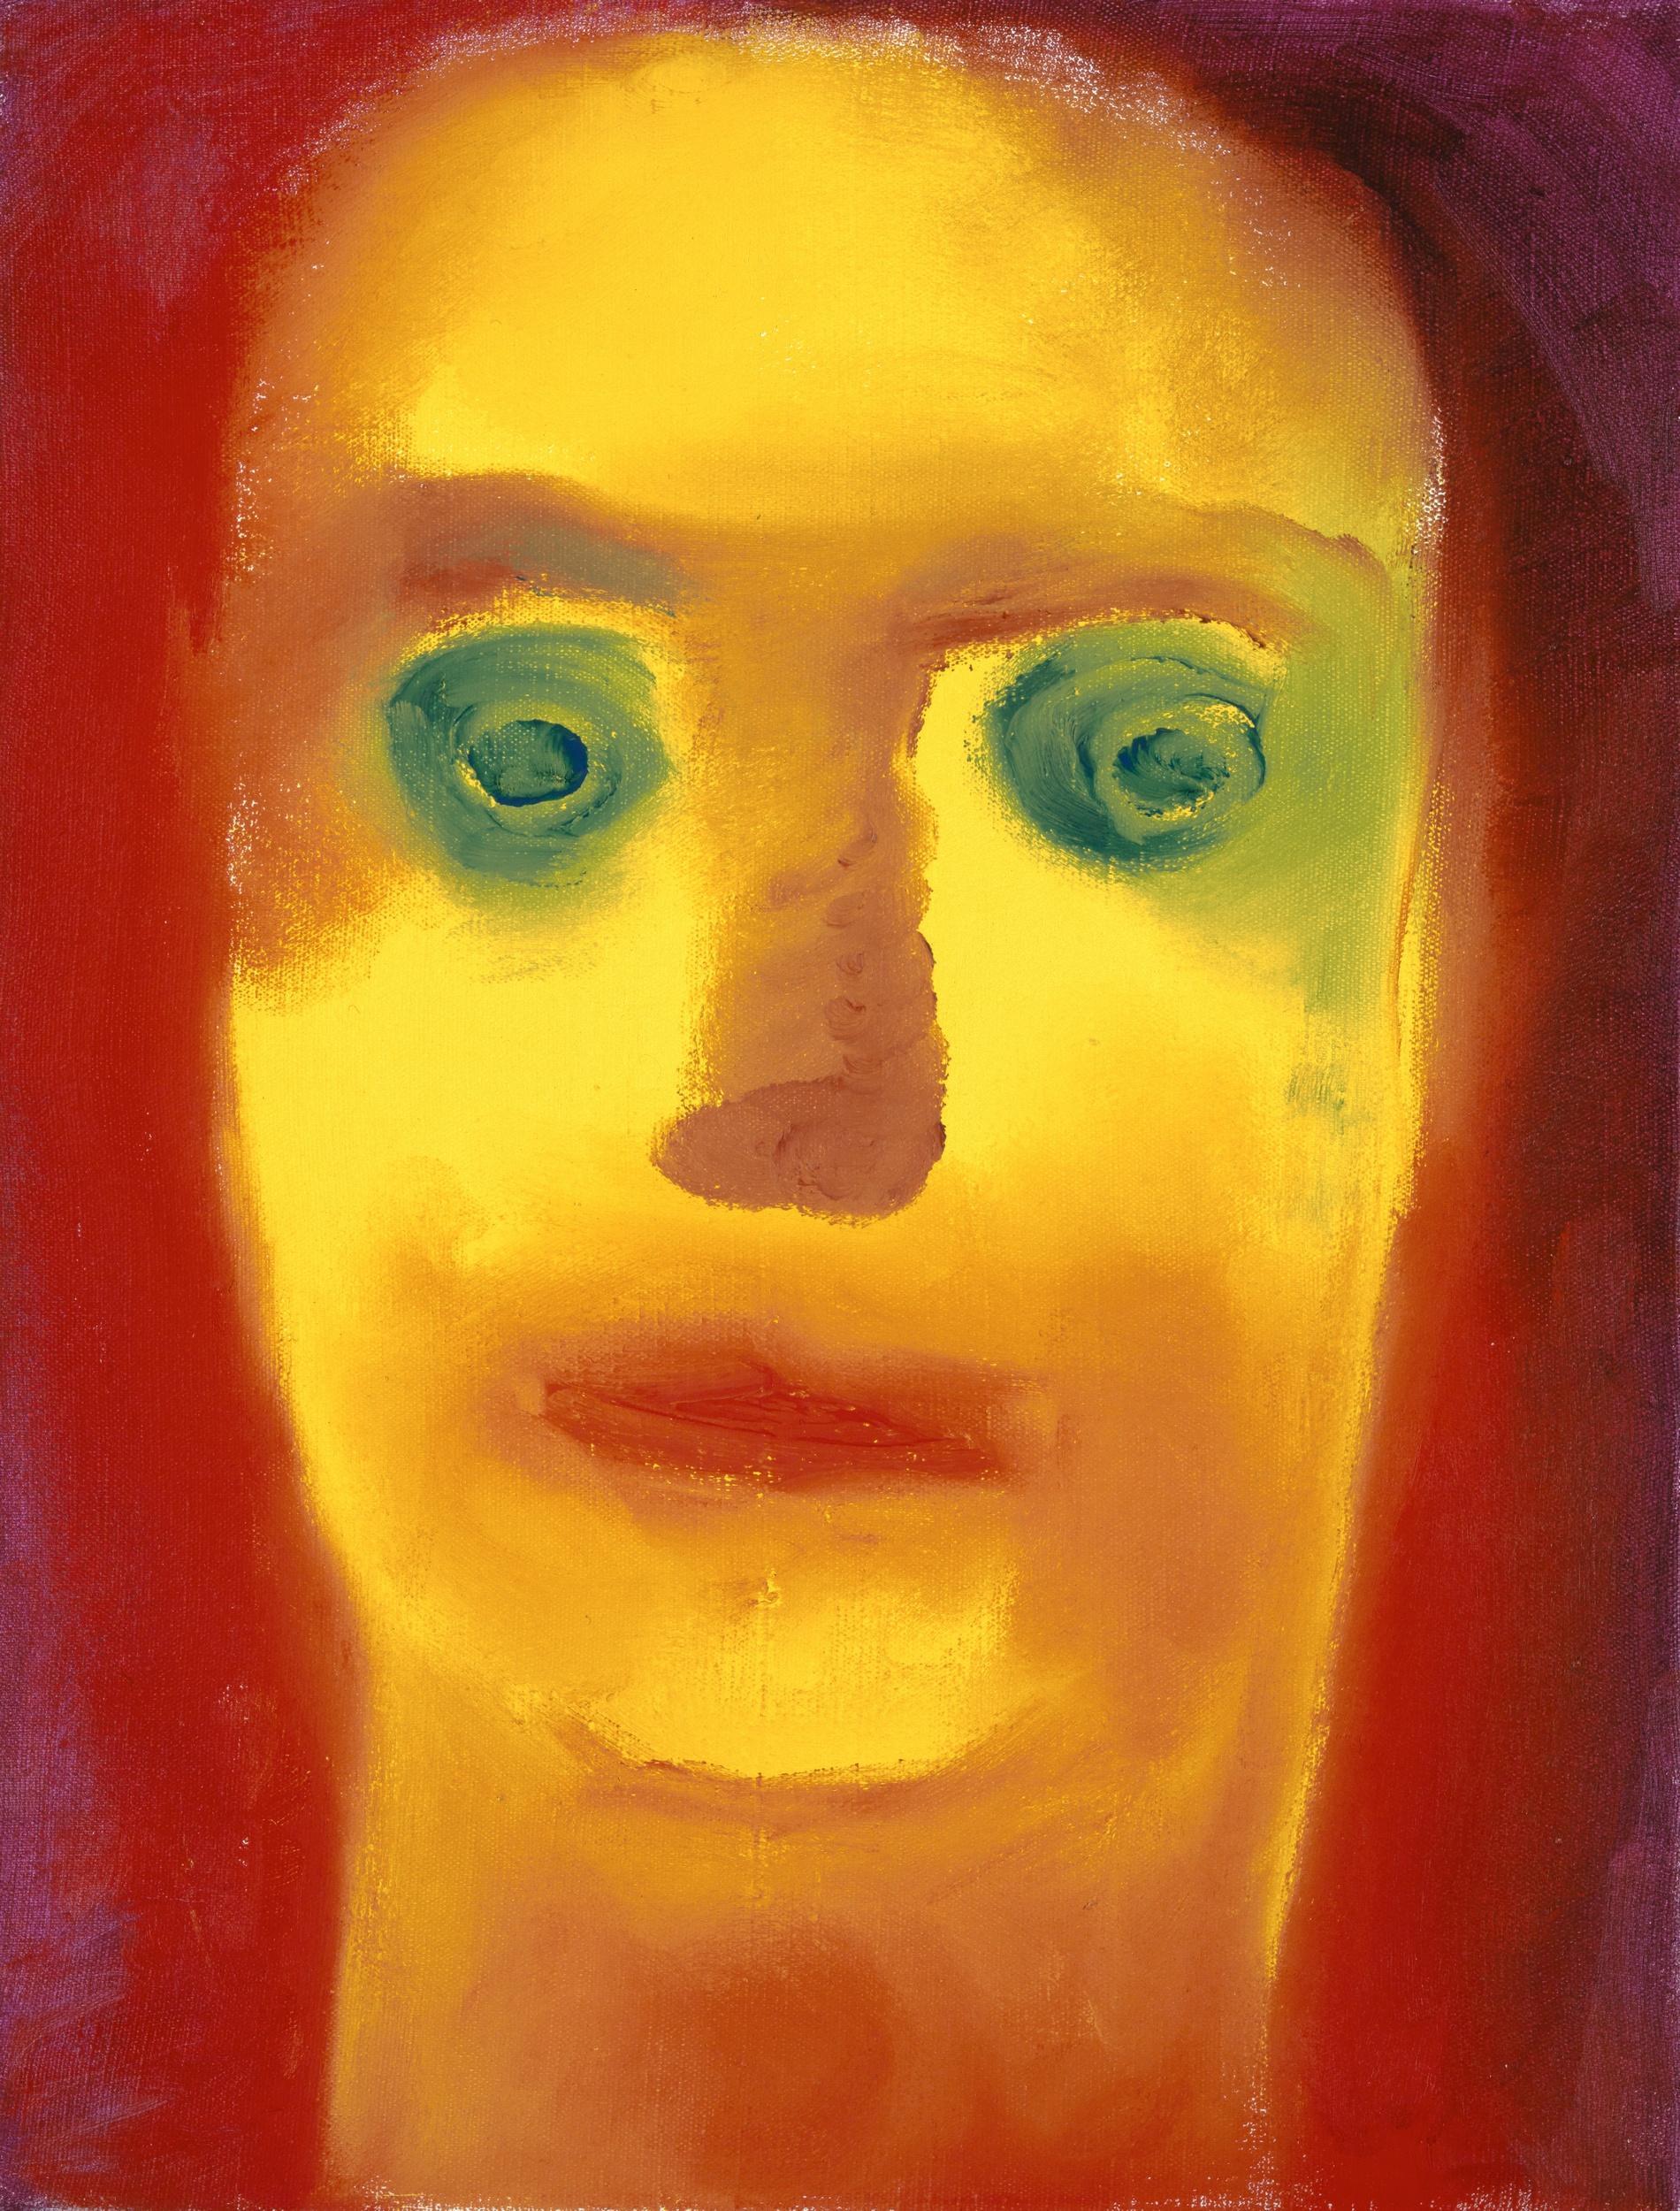 Miriam Cahn, Ohnte Titel (1. Mai), 1995, Öl auf Leinwand, 30.5 x 23.7 cm, Kunstmuseum Basel